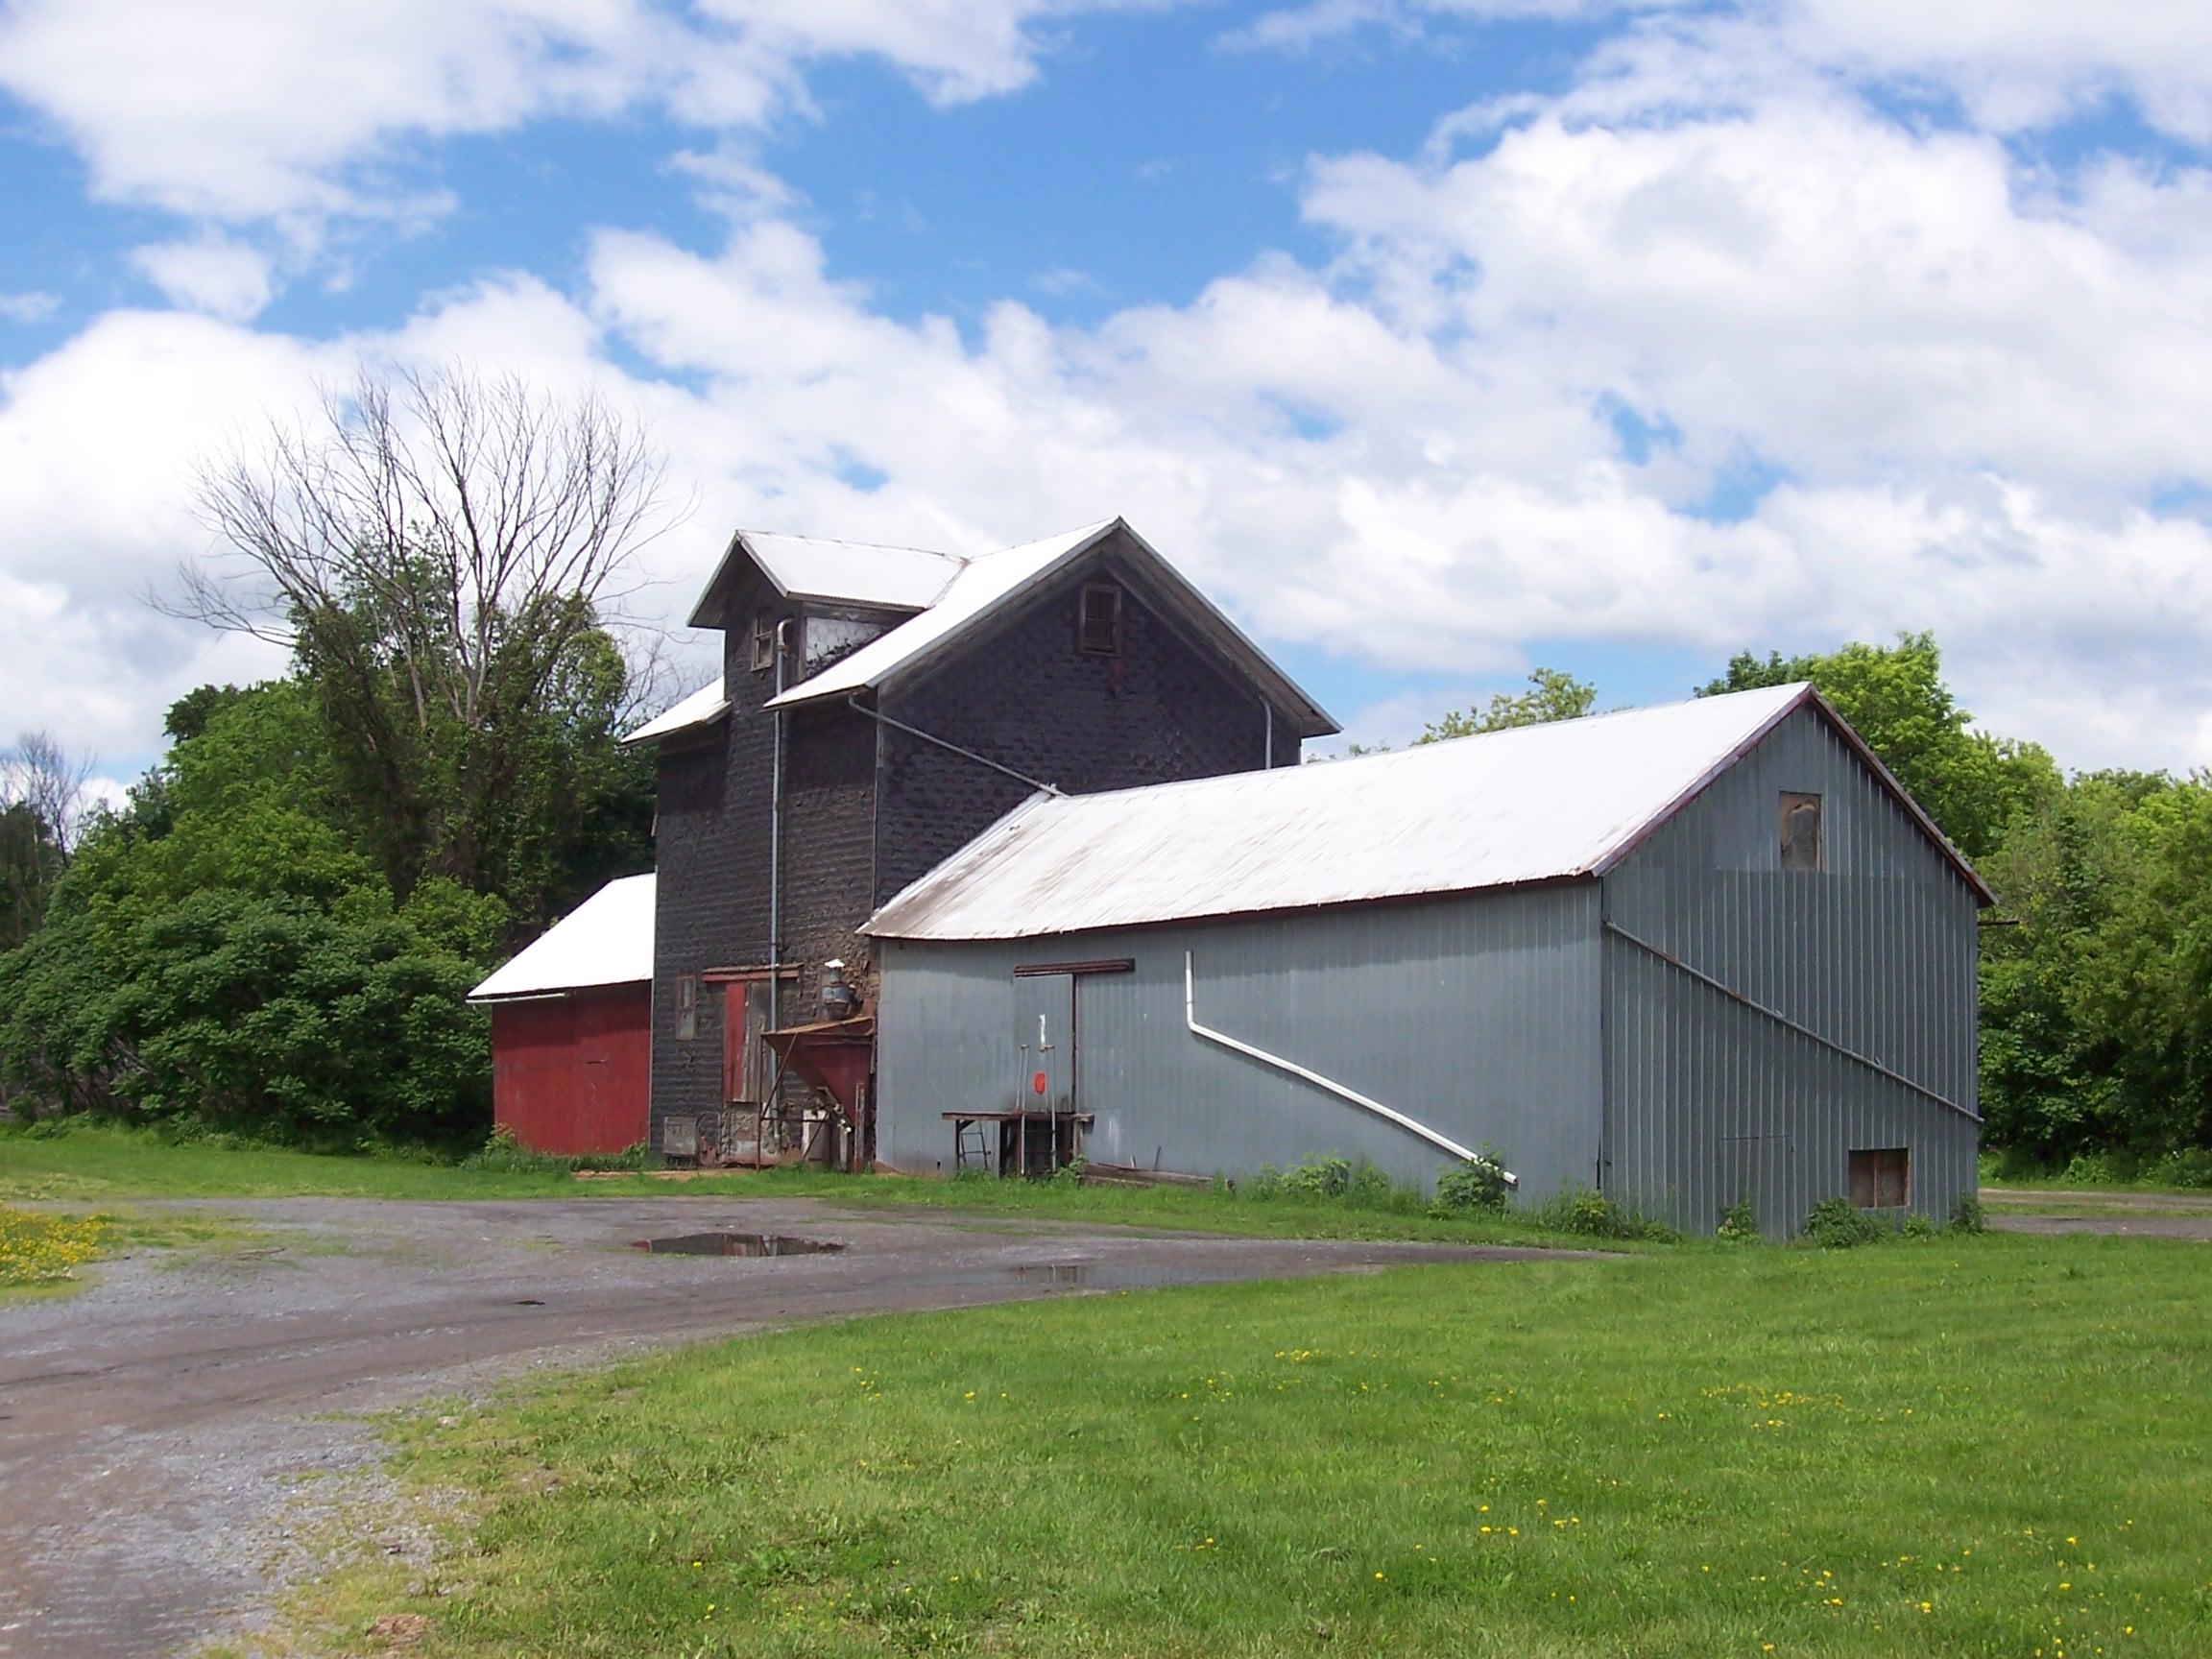 New york oneida county oriskany falls - Ny Vernon Ws Westshorerailroad